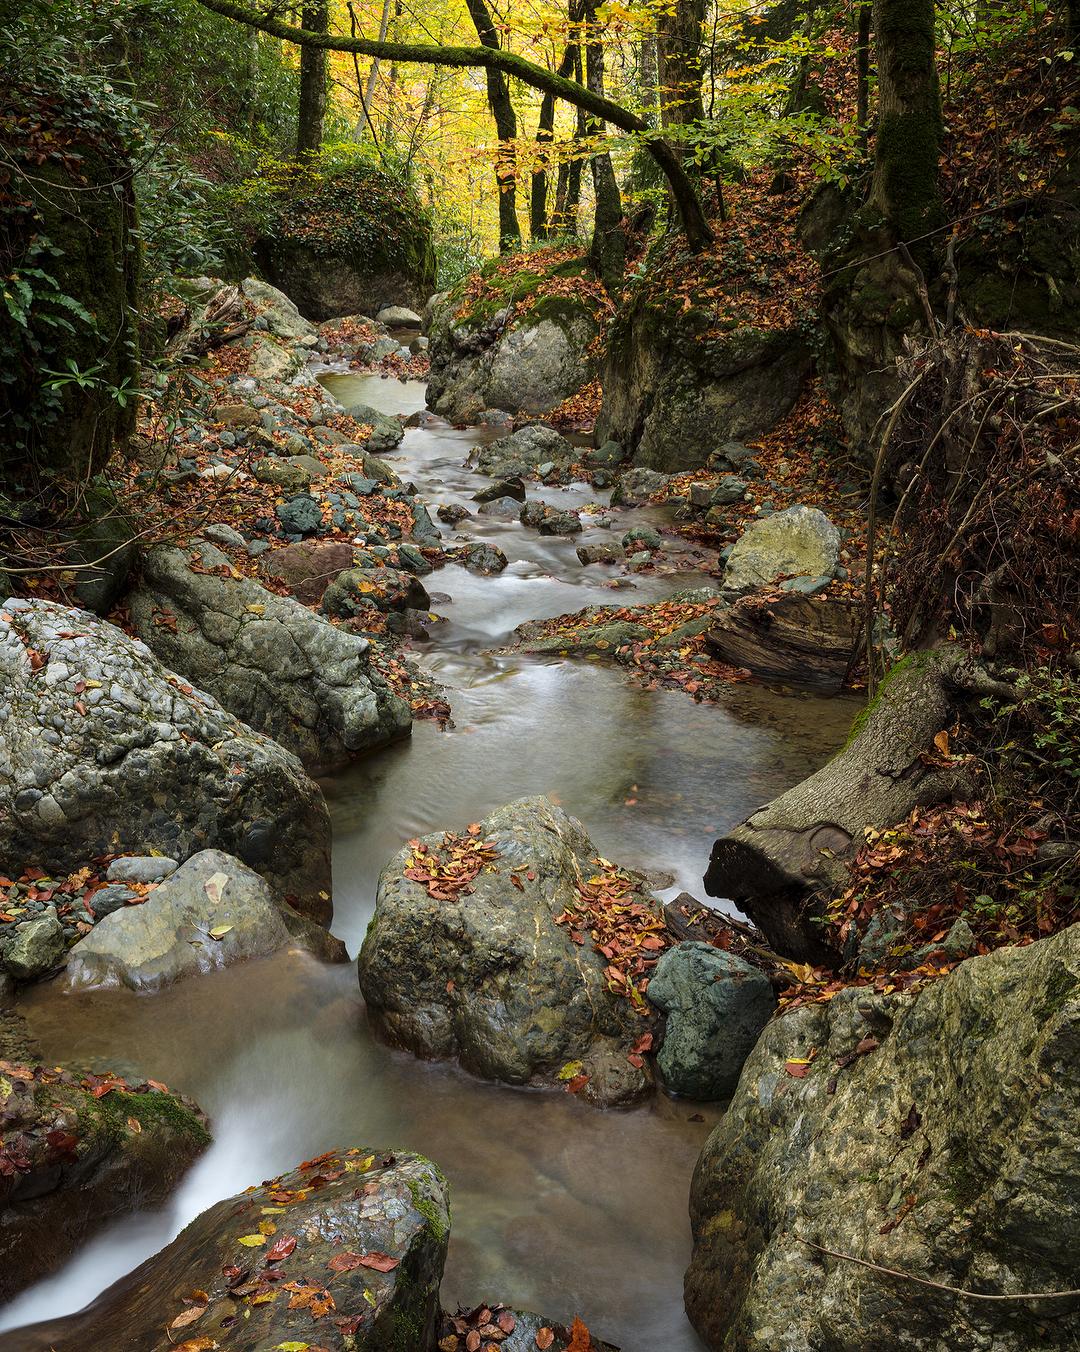 Donwload Photo Kaligrafi Yenice, Karabük, Türkiye غابات مدينة ينيجه في تركيا…- ozcay